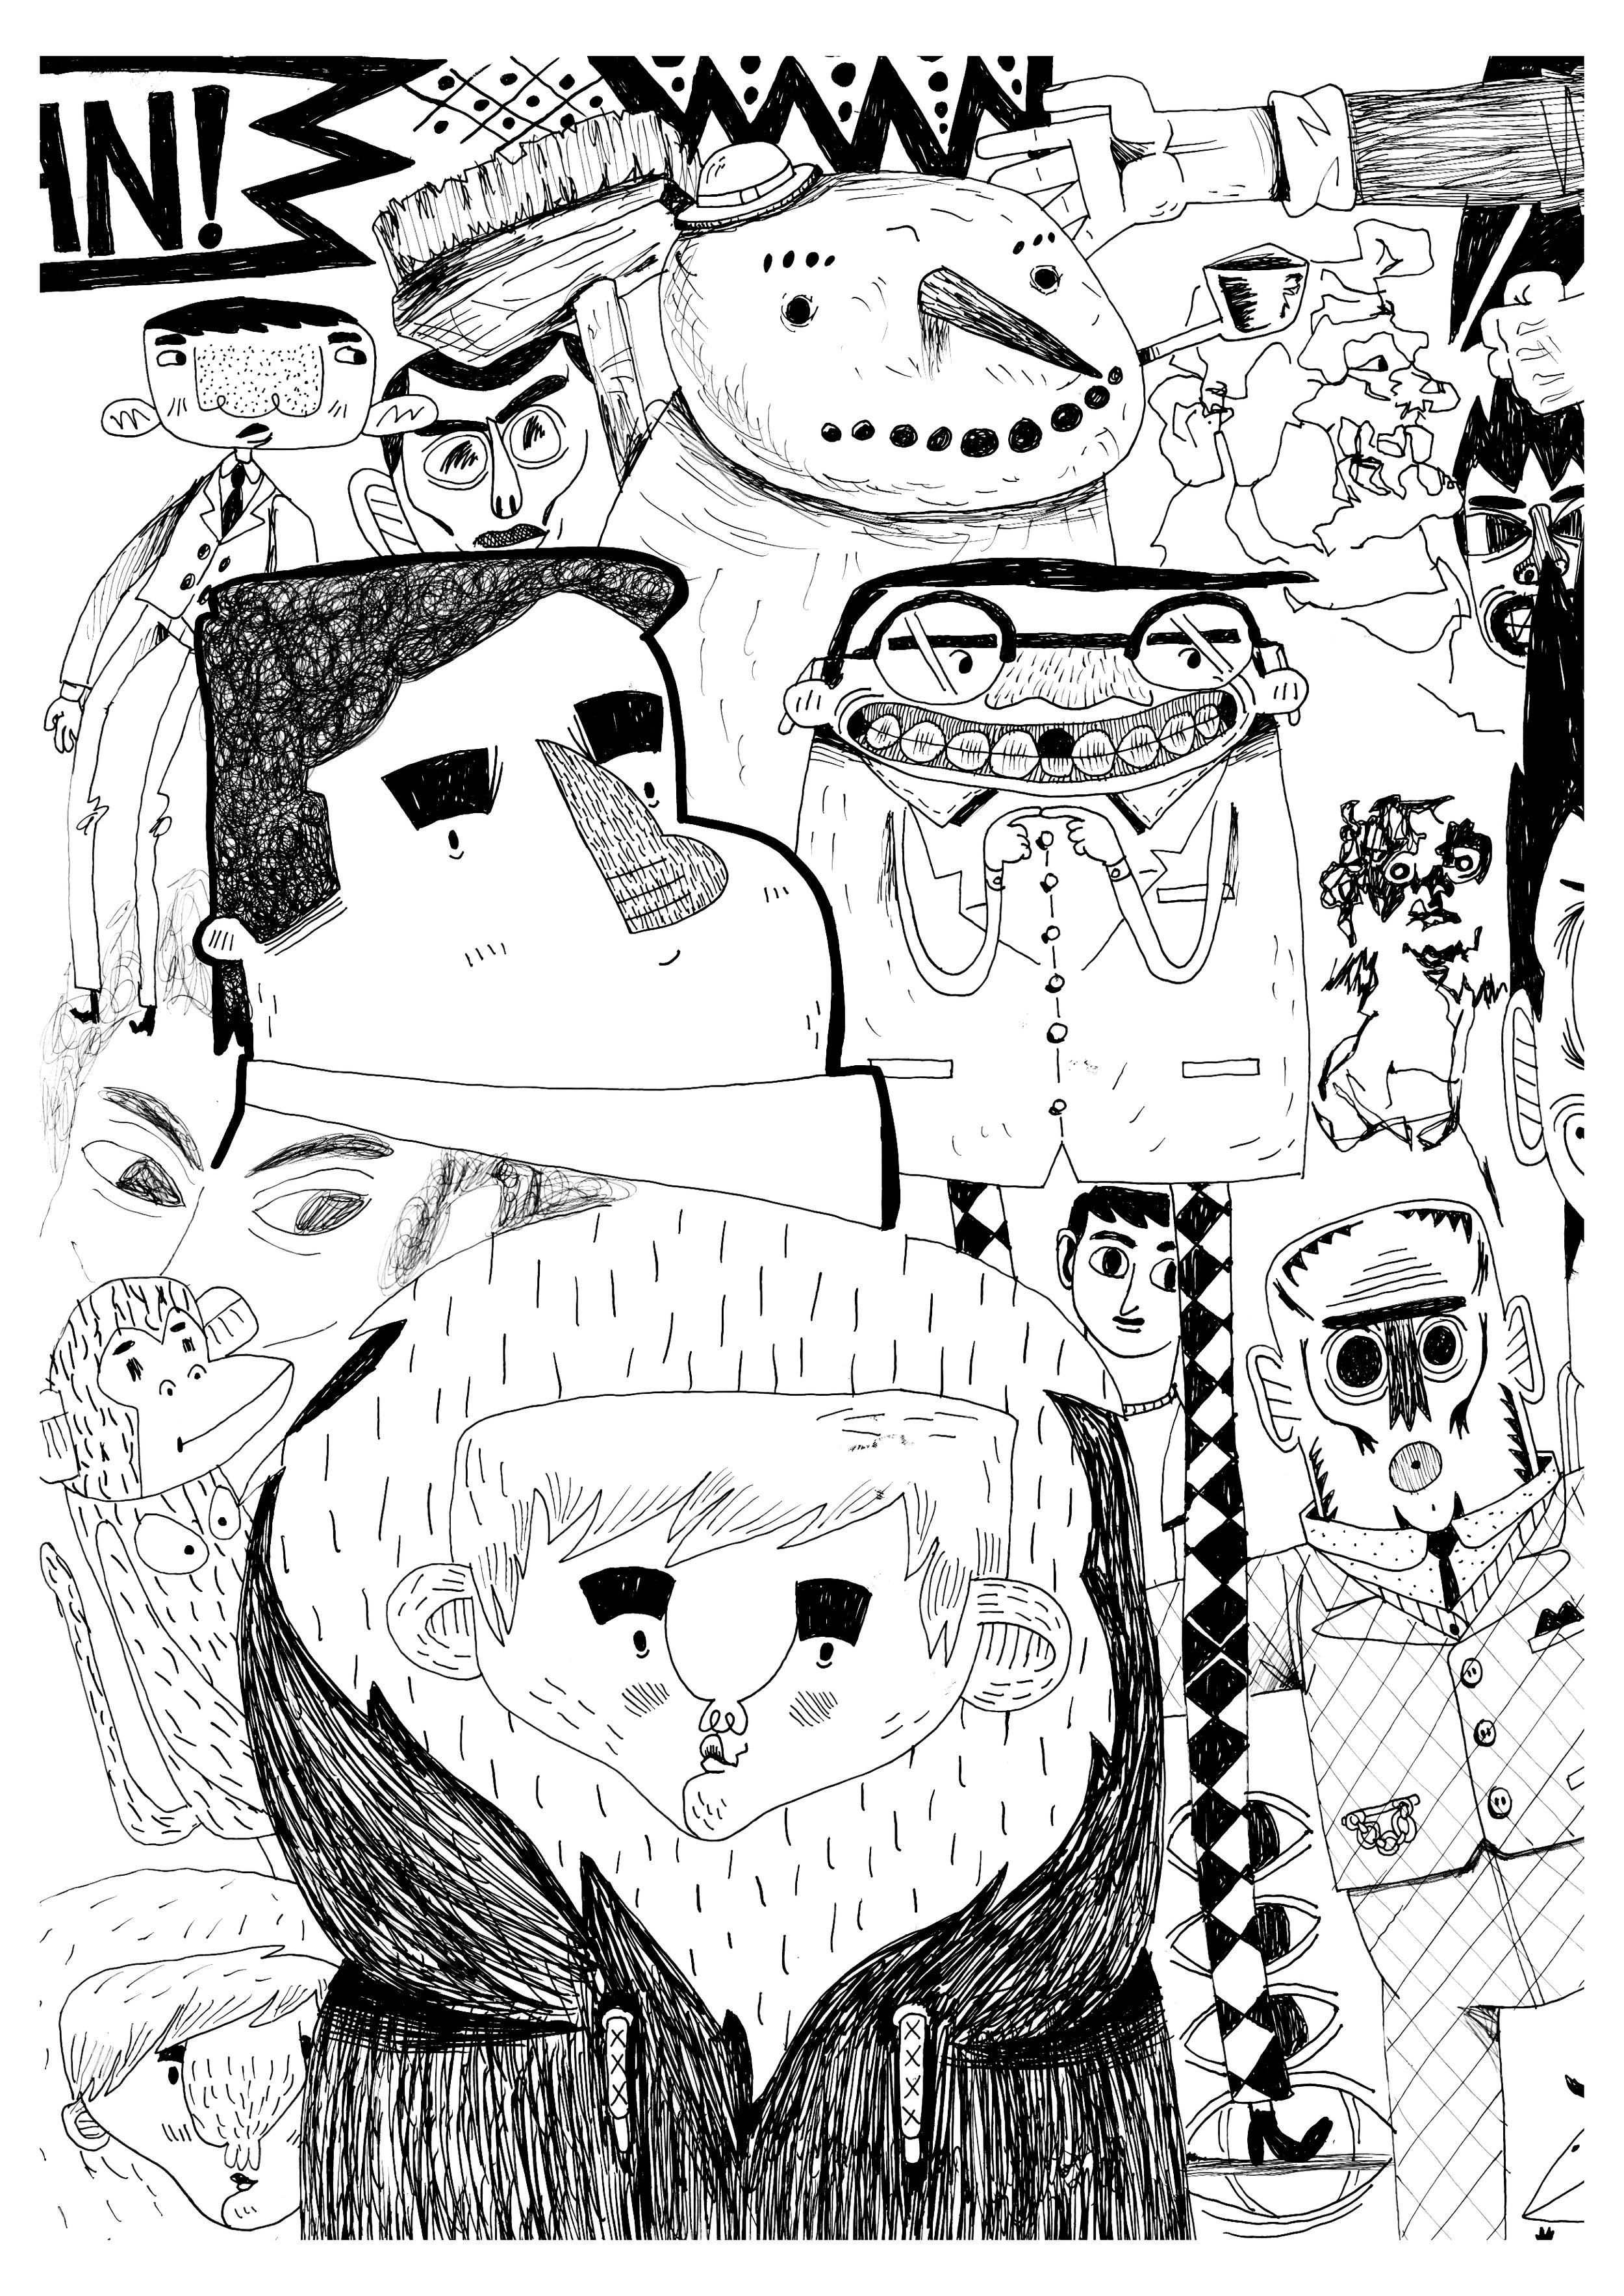 Pascal_Zaffiro_Doodle_38.jpg